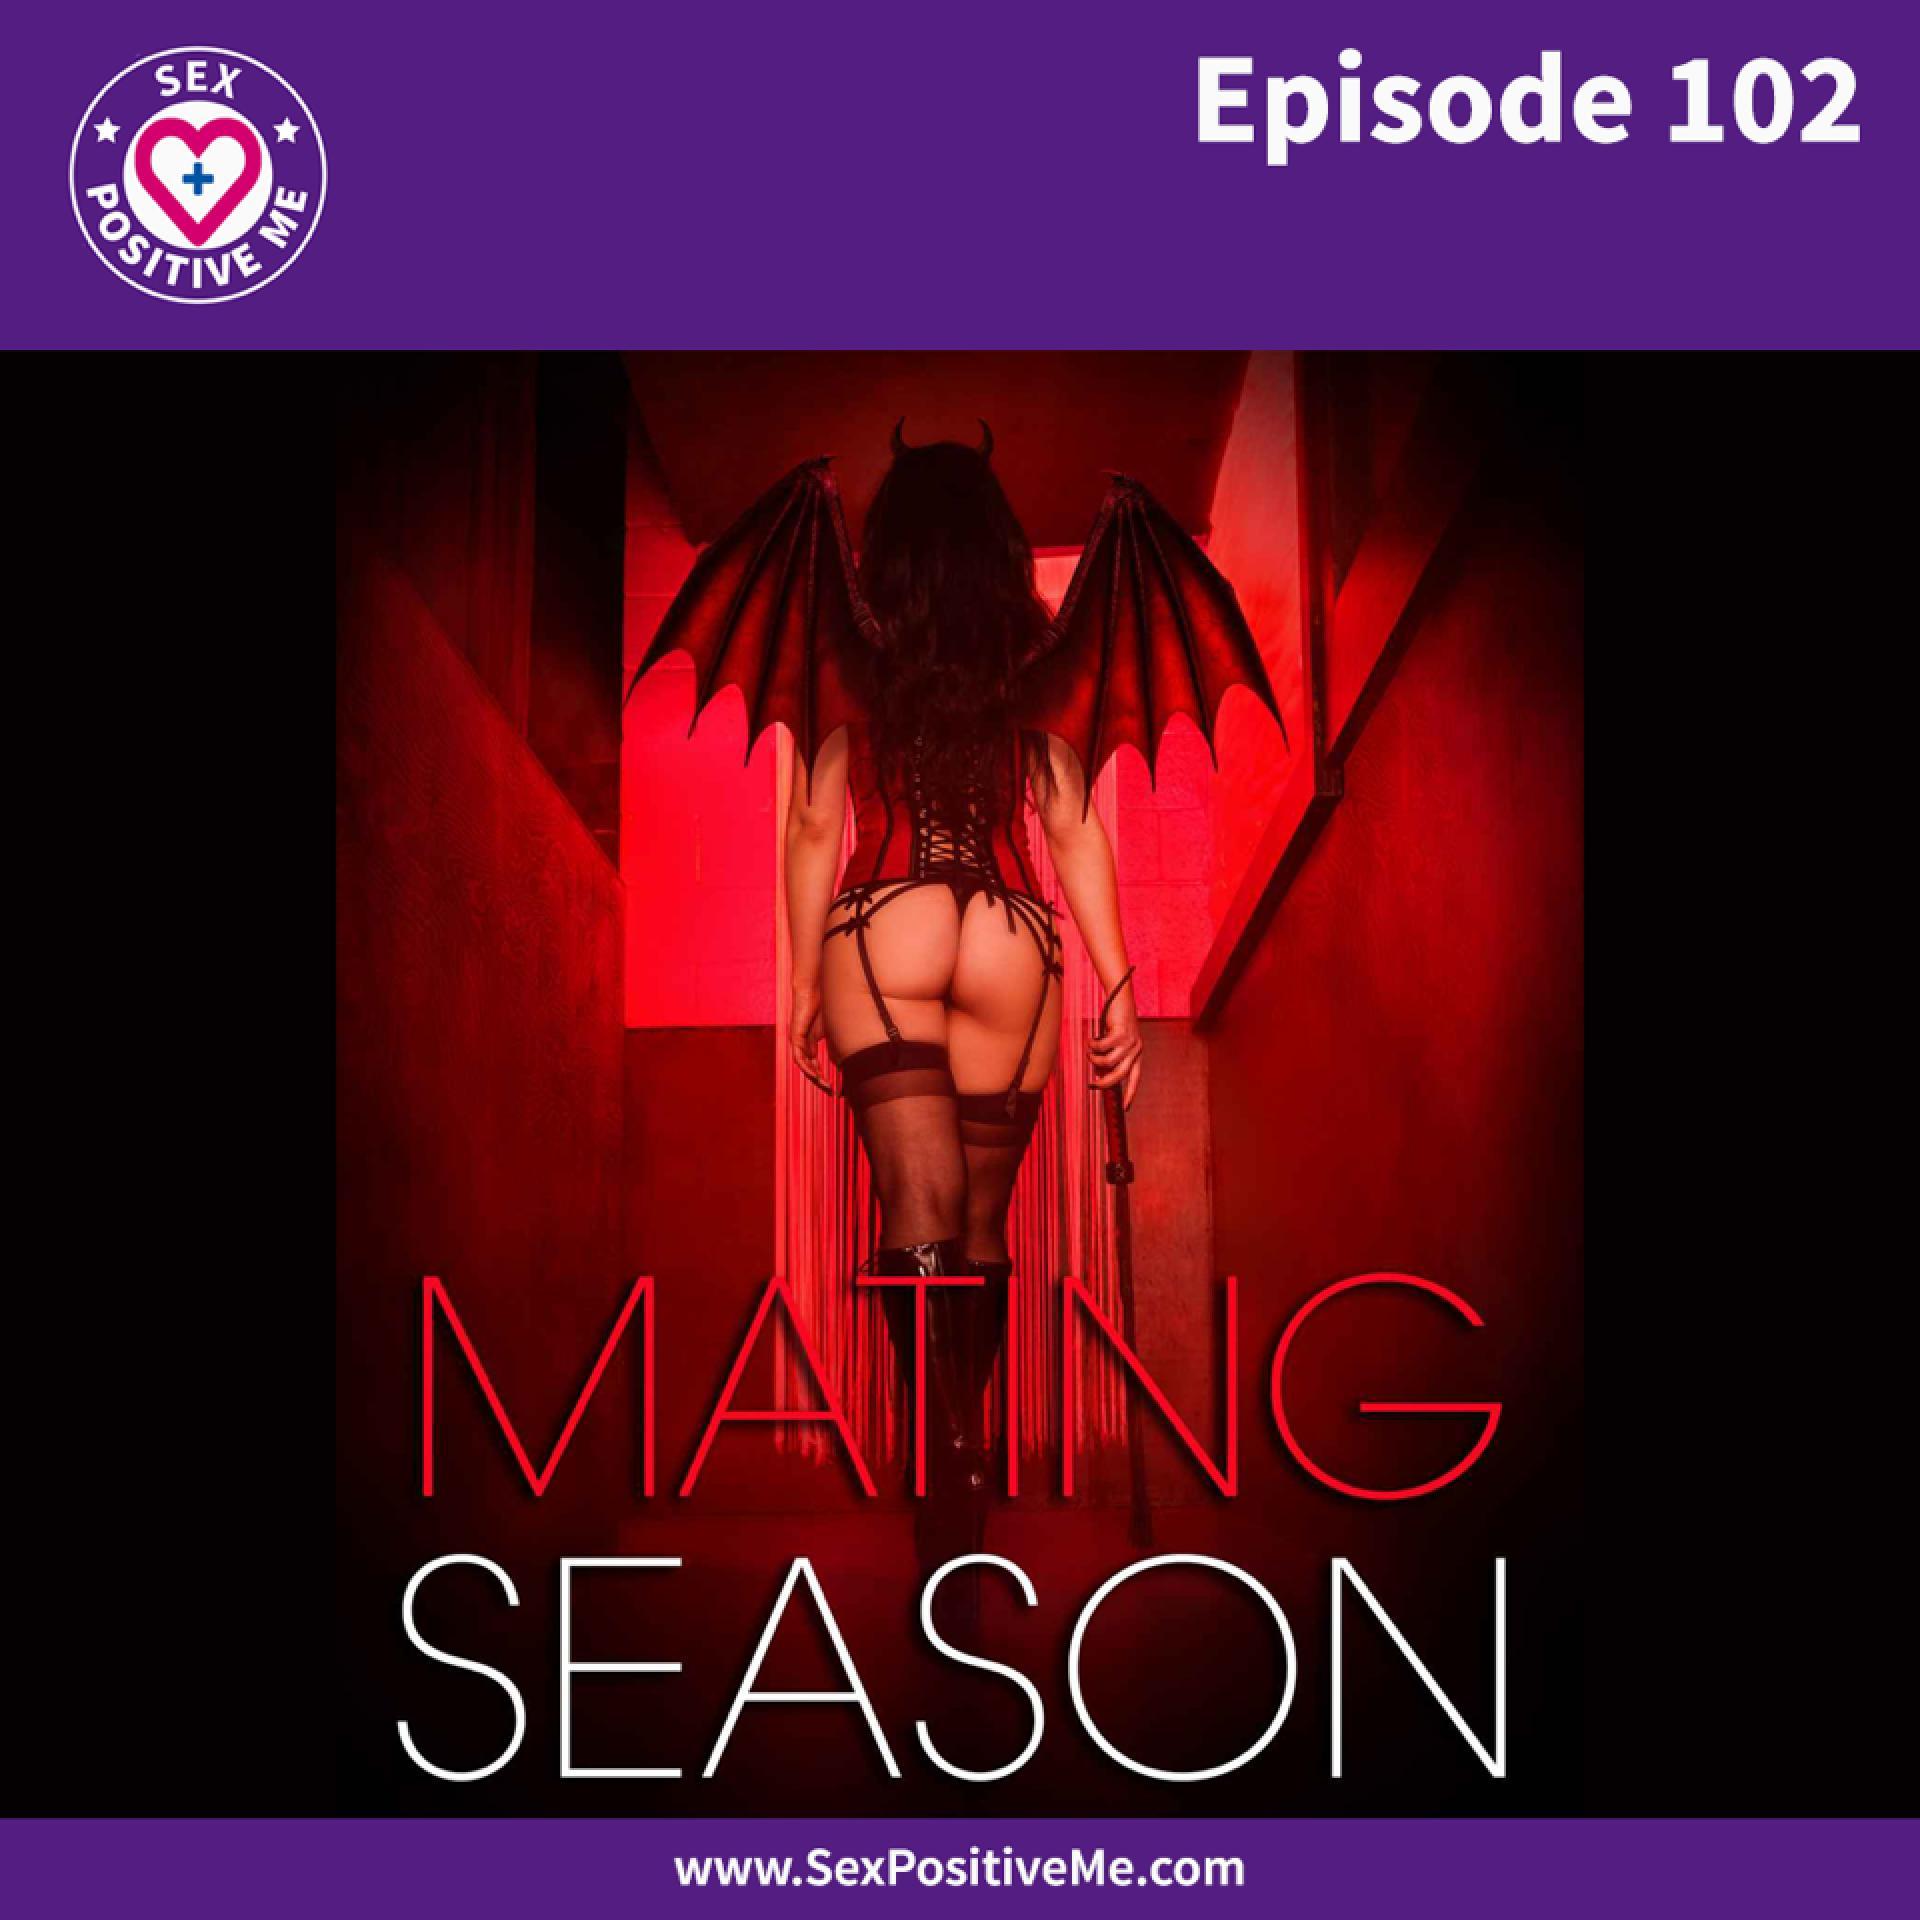 SDC Sex Positive Me Podcast Lexi Sylver Mating Season Erotic Short Stories Book Cover